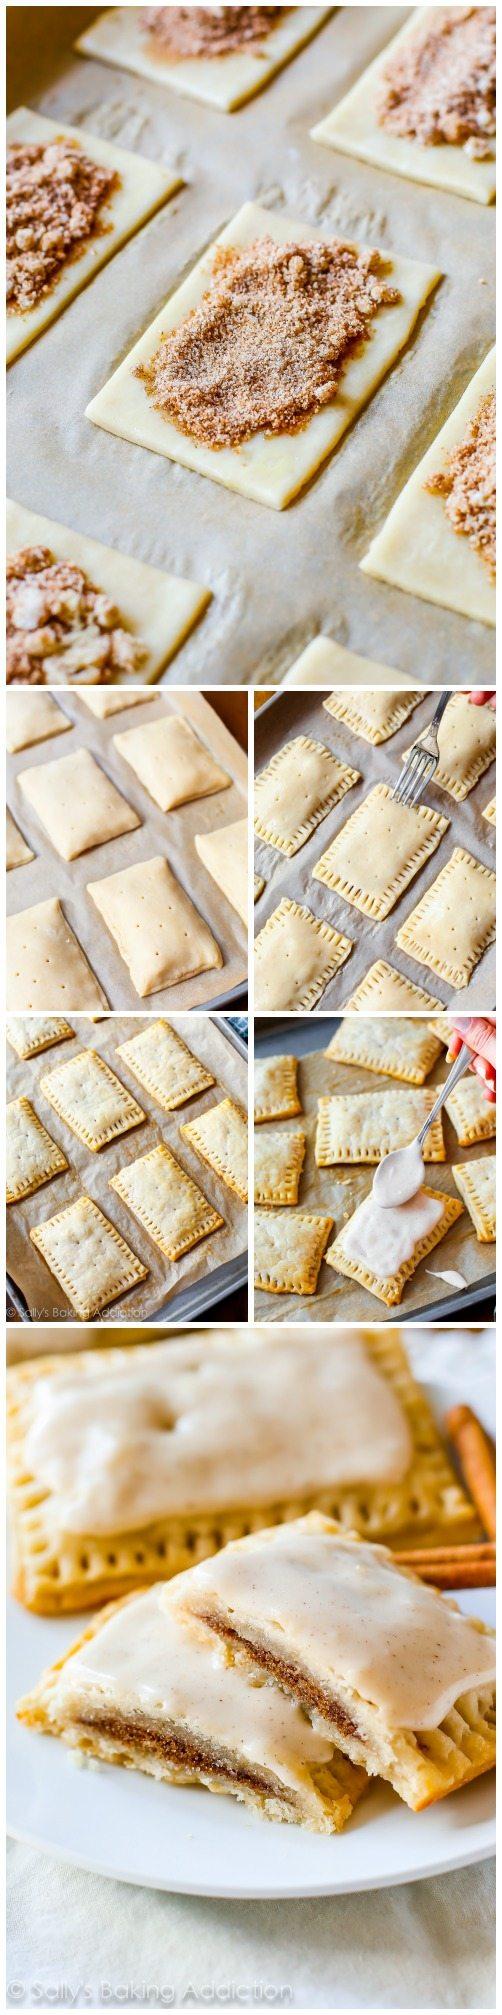 Homemade Brown Sugar Cinnamon Pop-Tarts are even tastier than the ...